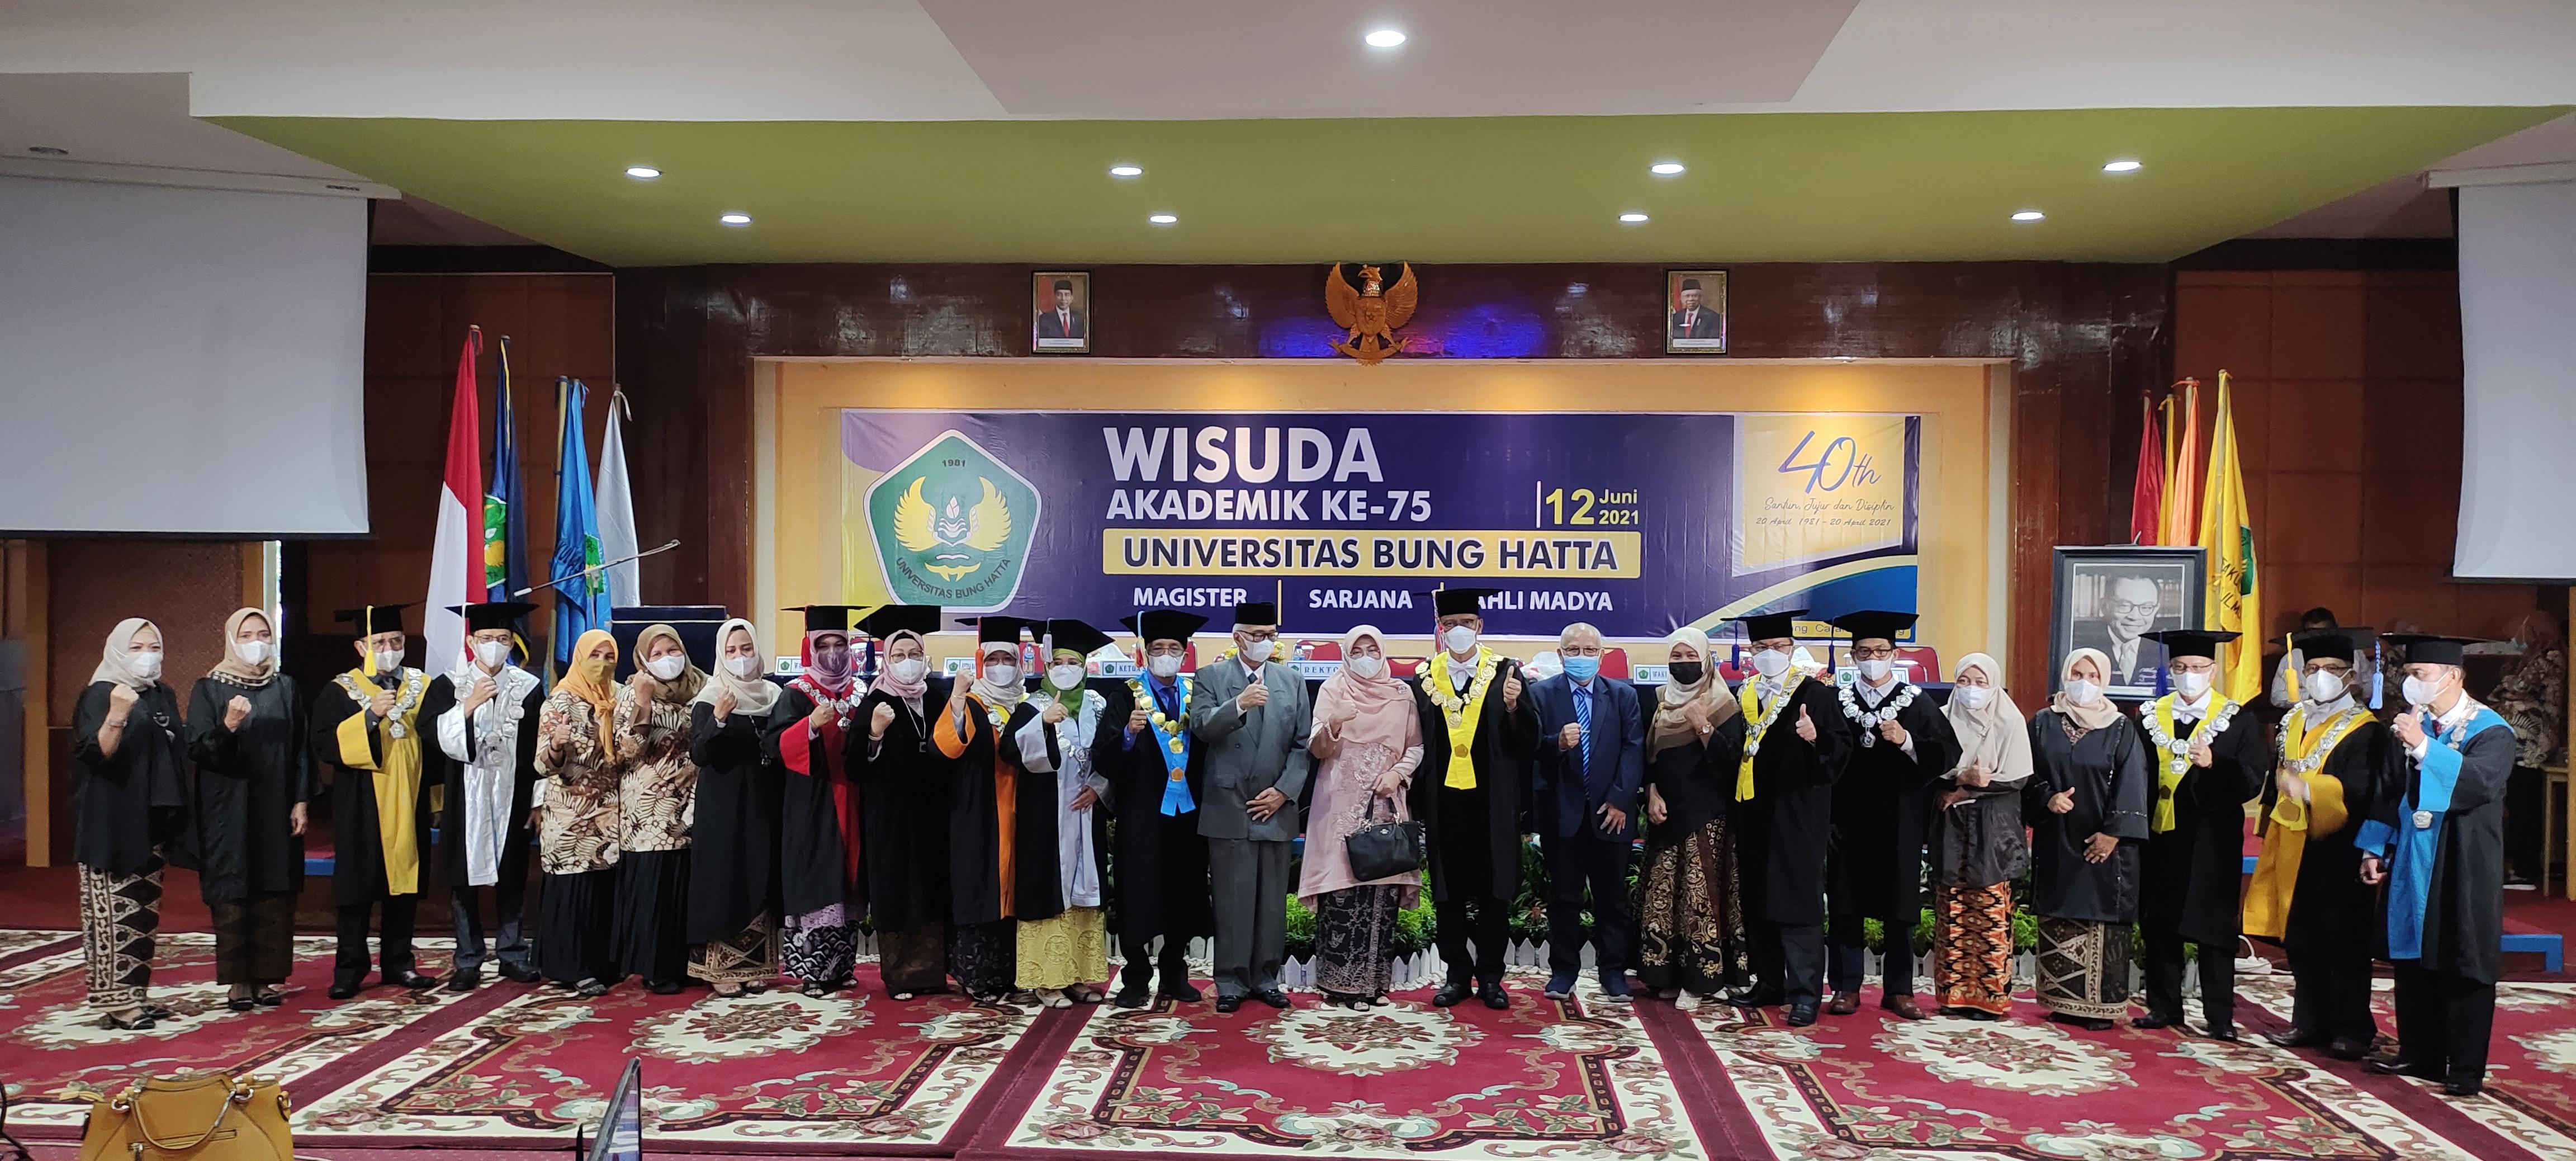 Rektor Universitas Bung Hatta Melantik Wisudawan Periode ke-75